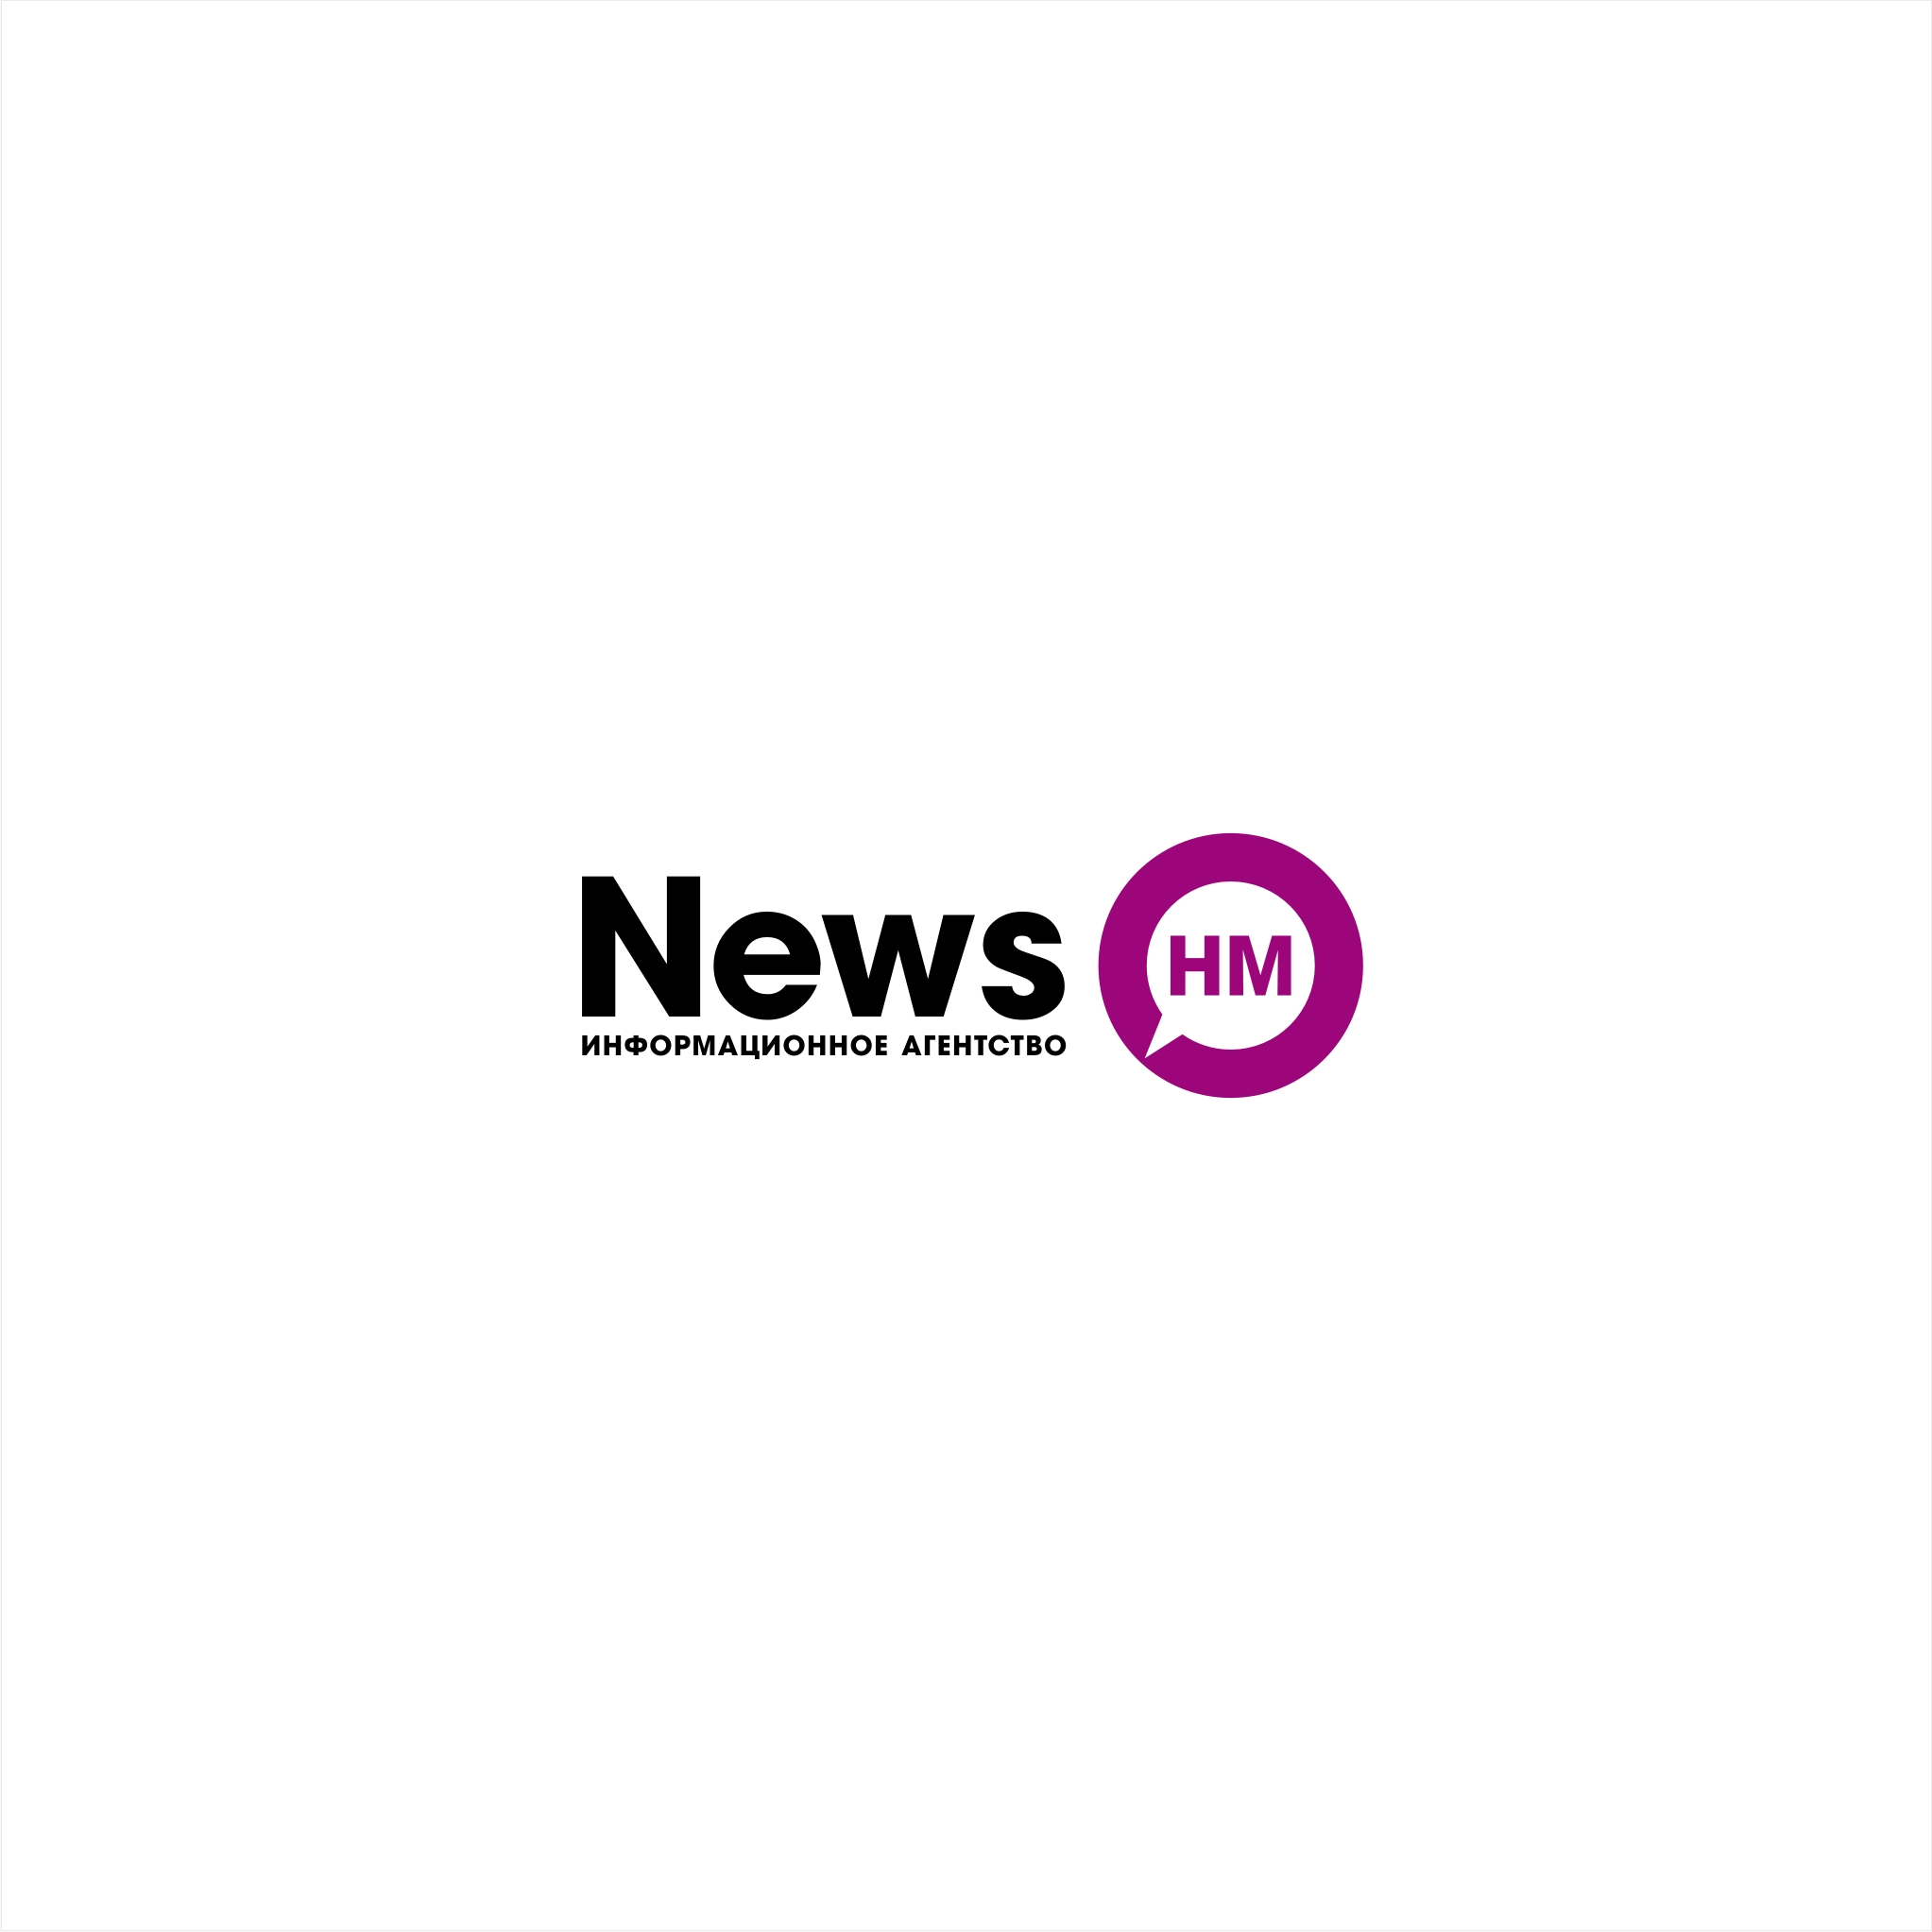 Логотип для информационного агентства фото f_8855aa68b19339ad.jpg